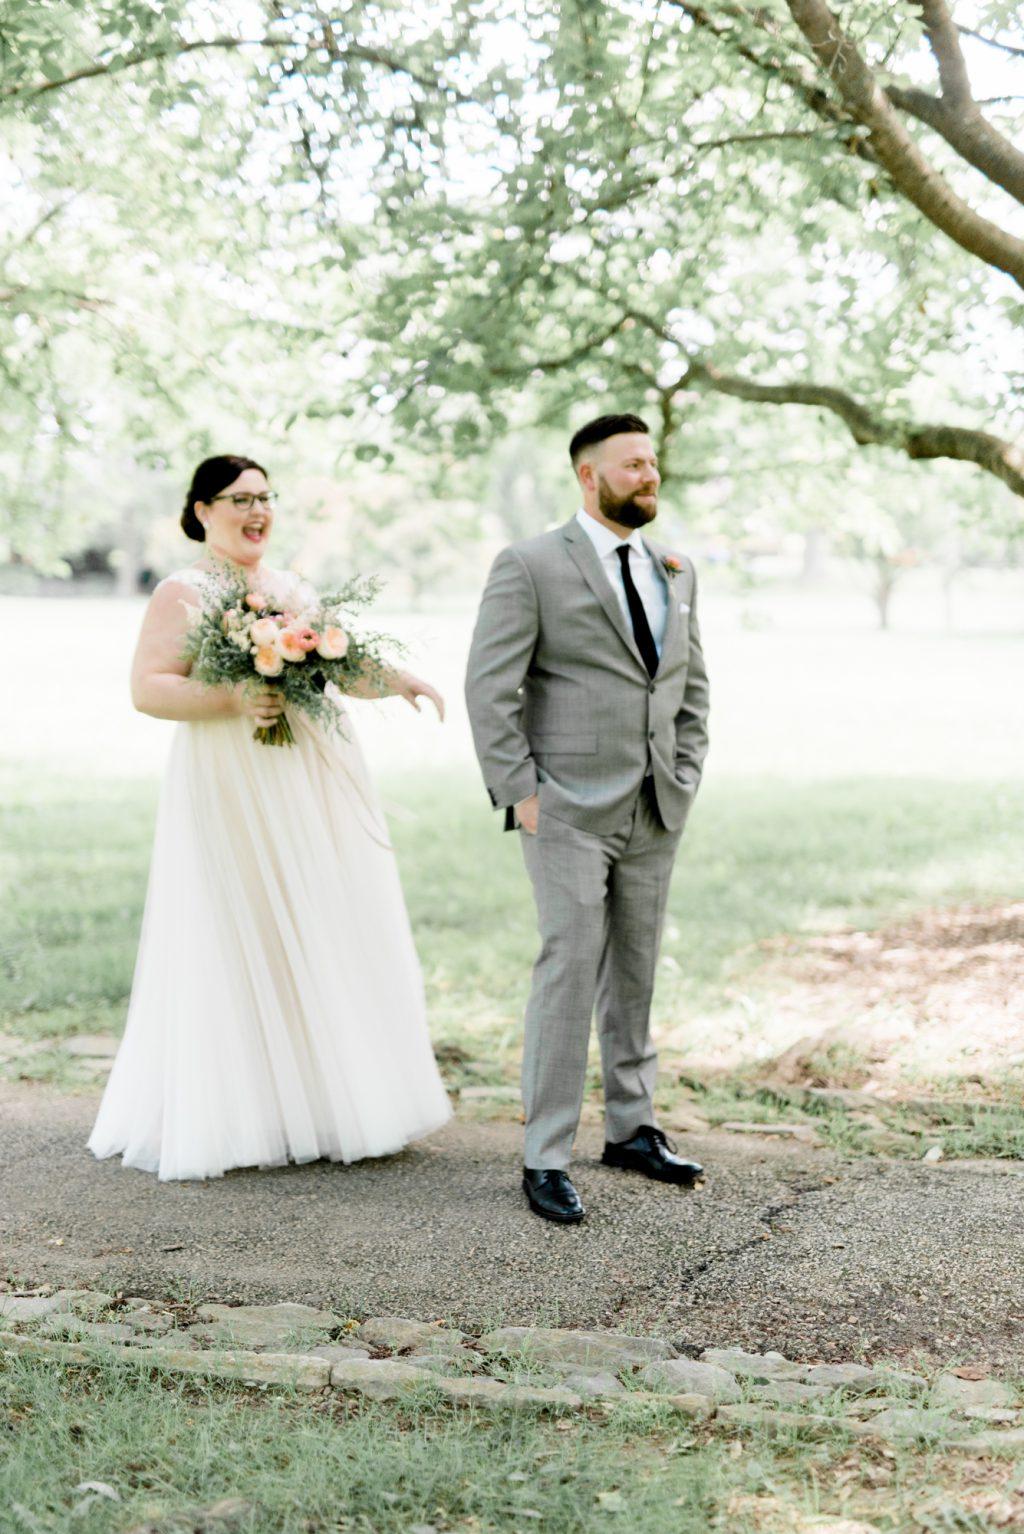 haley-richter-photo-west-chester-summer-wedding-boxcar-brewery-028